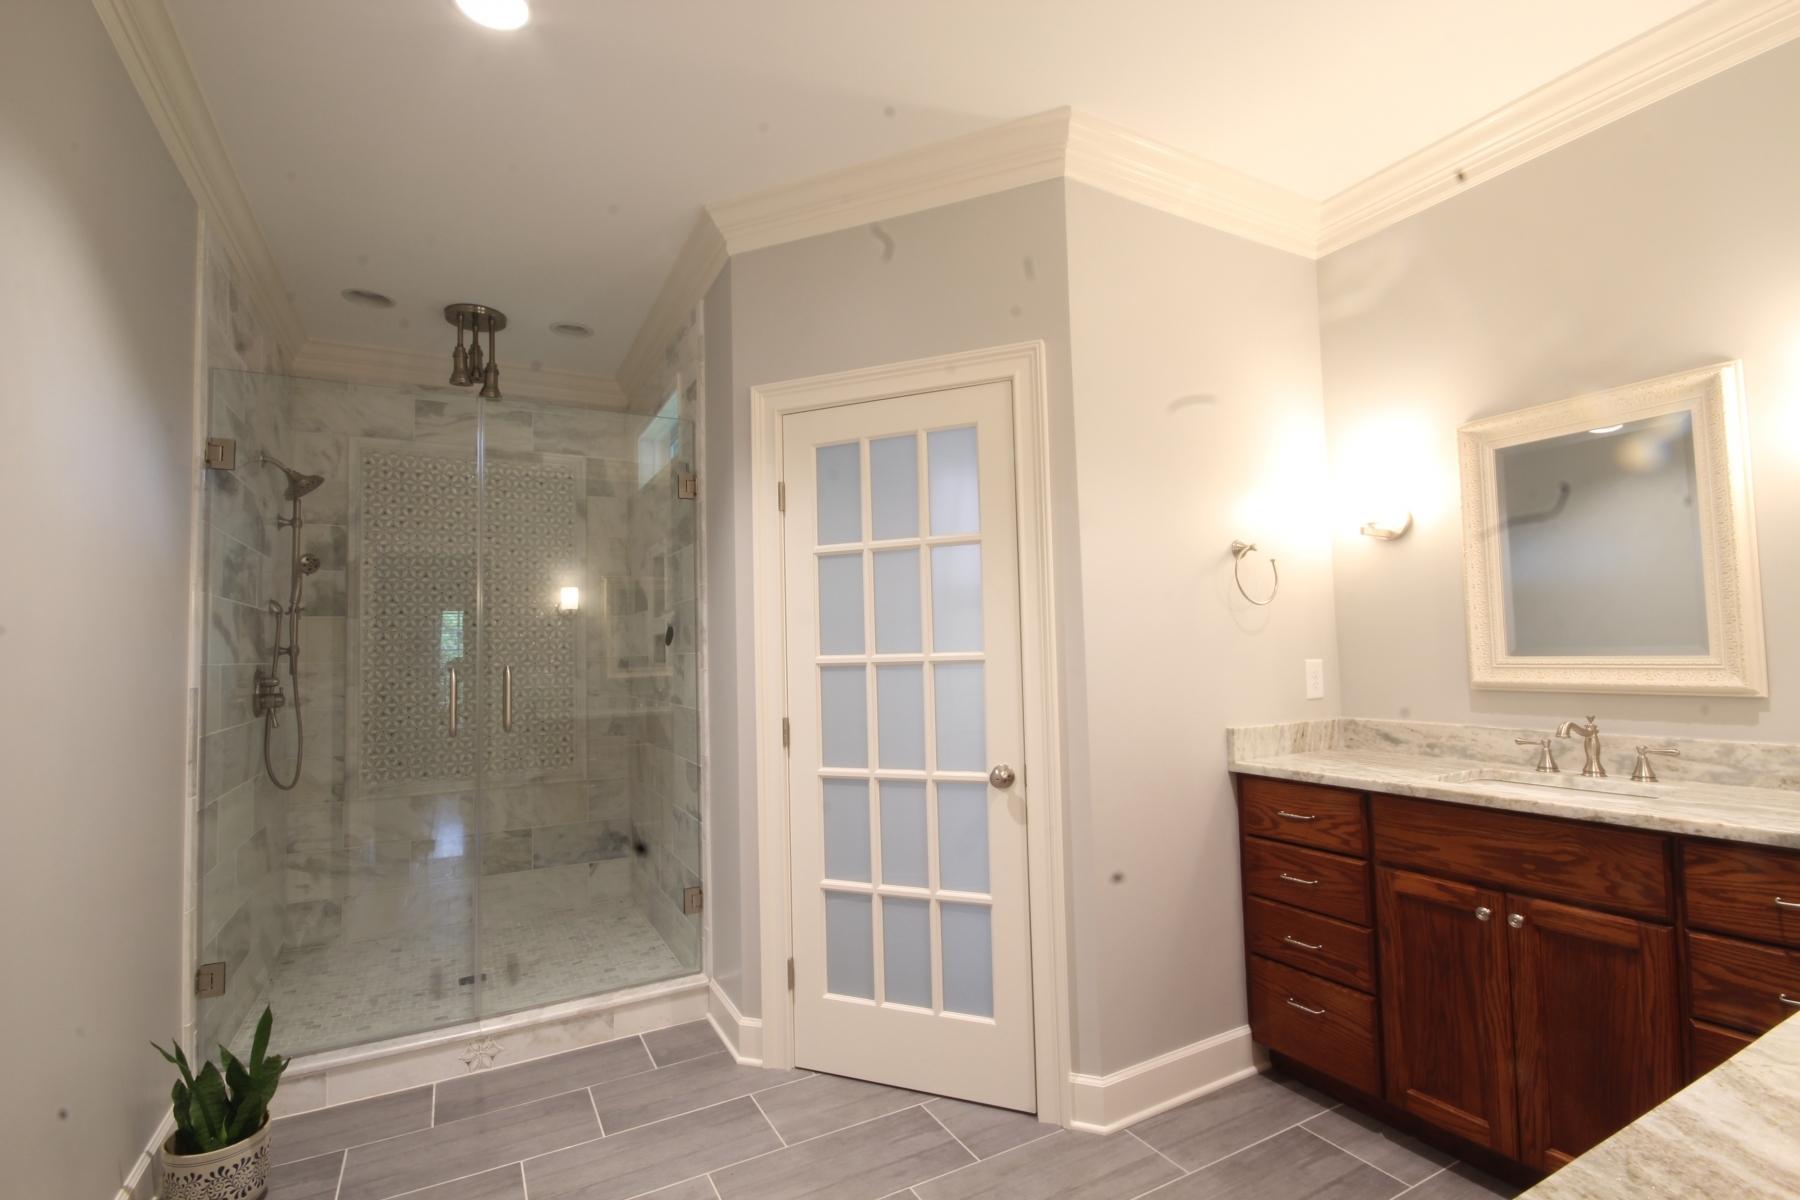 10-bh-bathroom-remodel-5